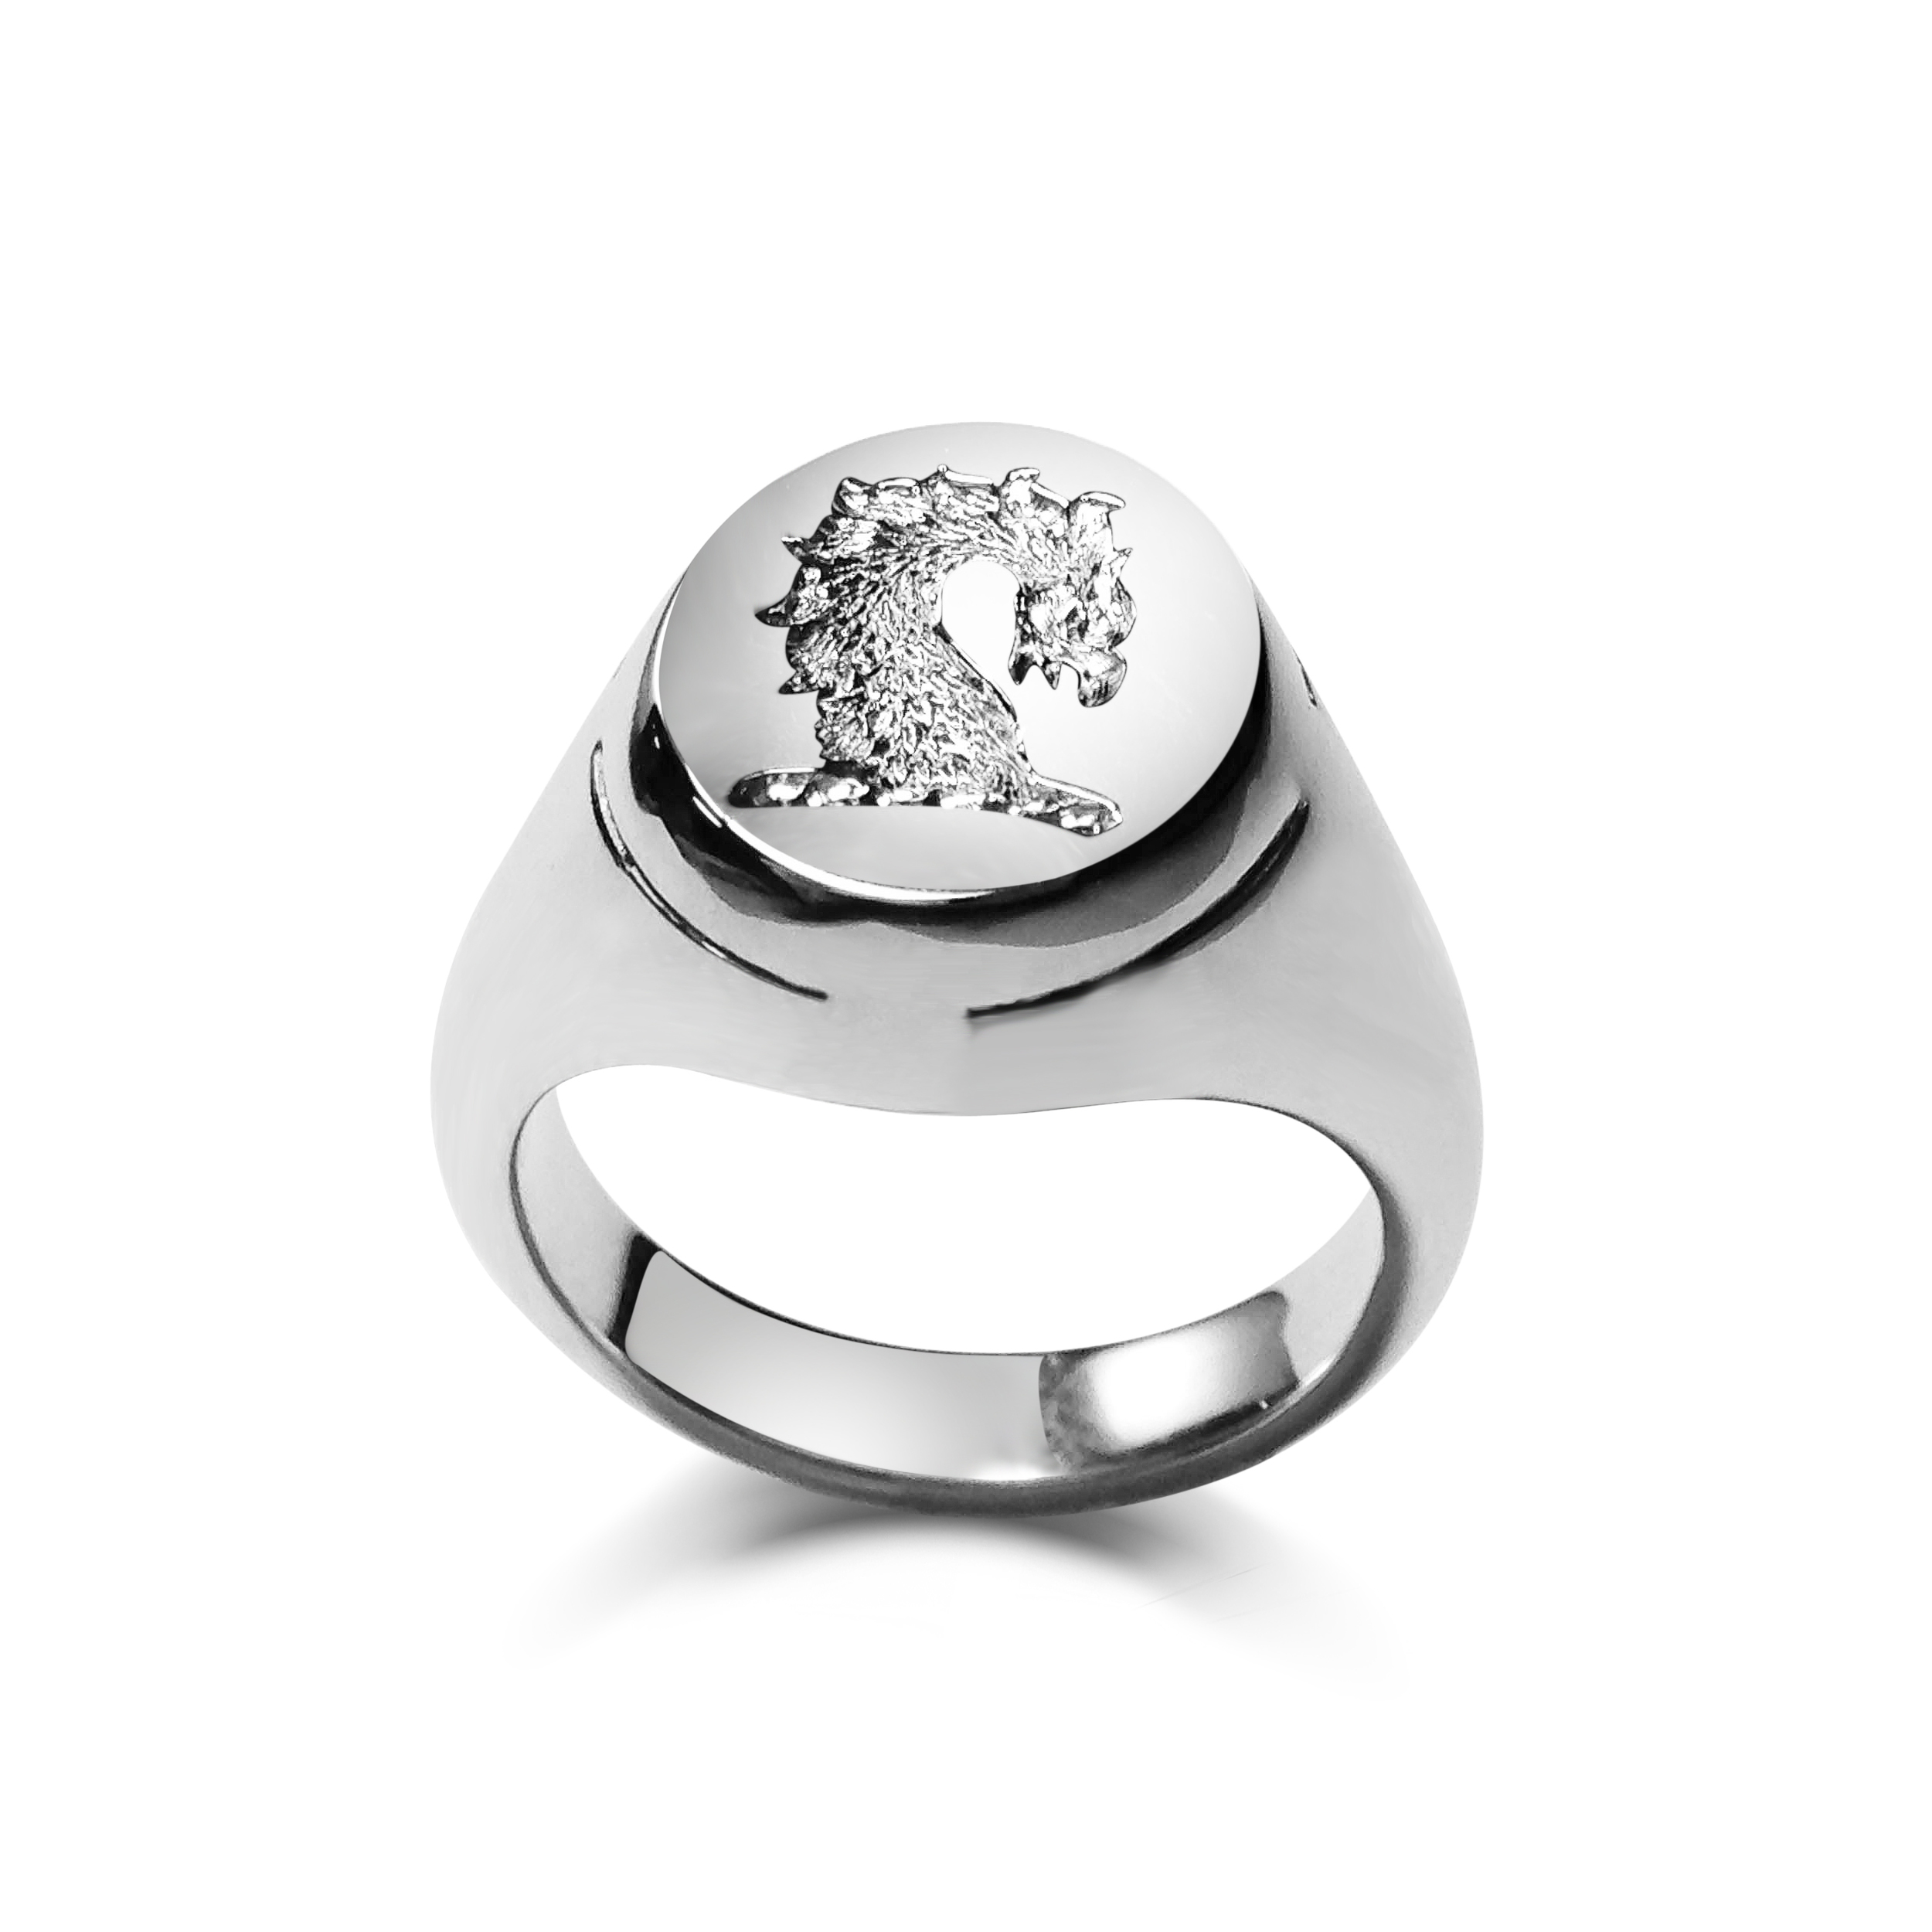 18ct-white-gold-signet-ring.jpg